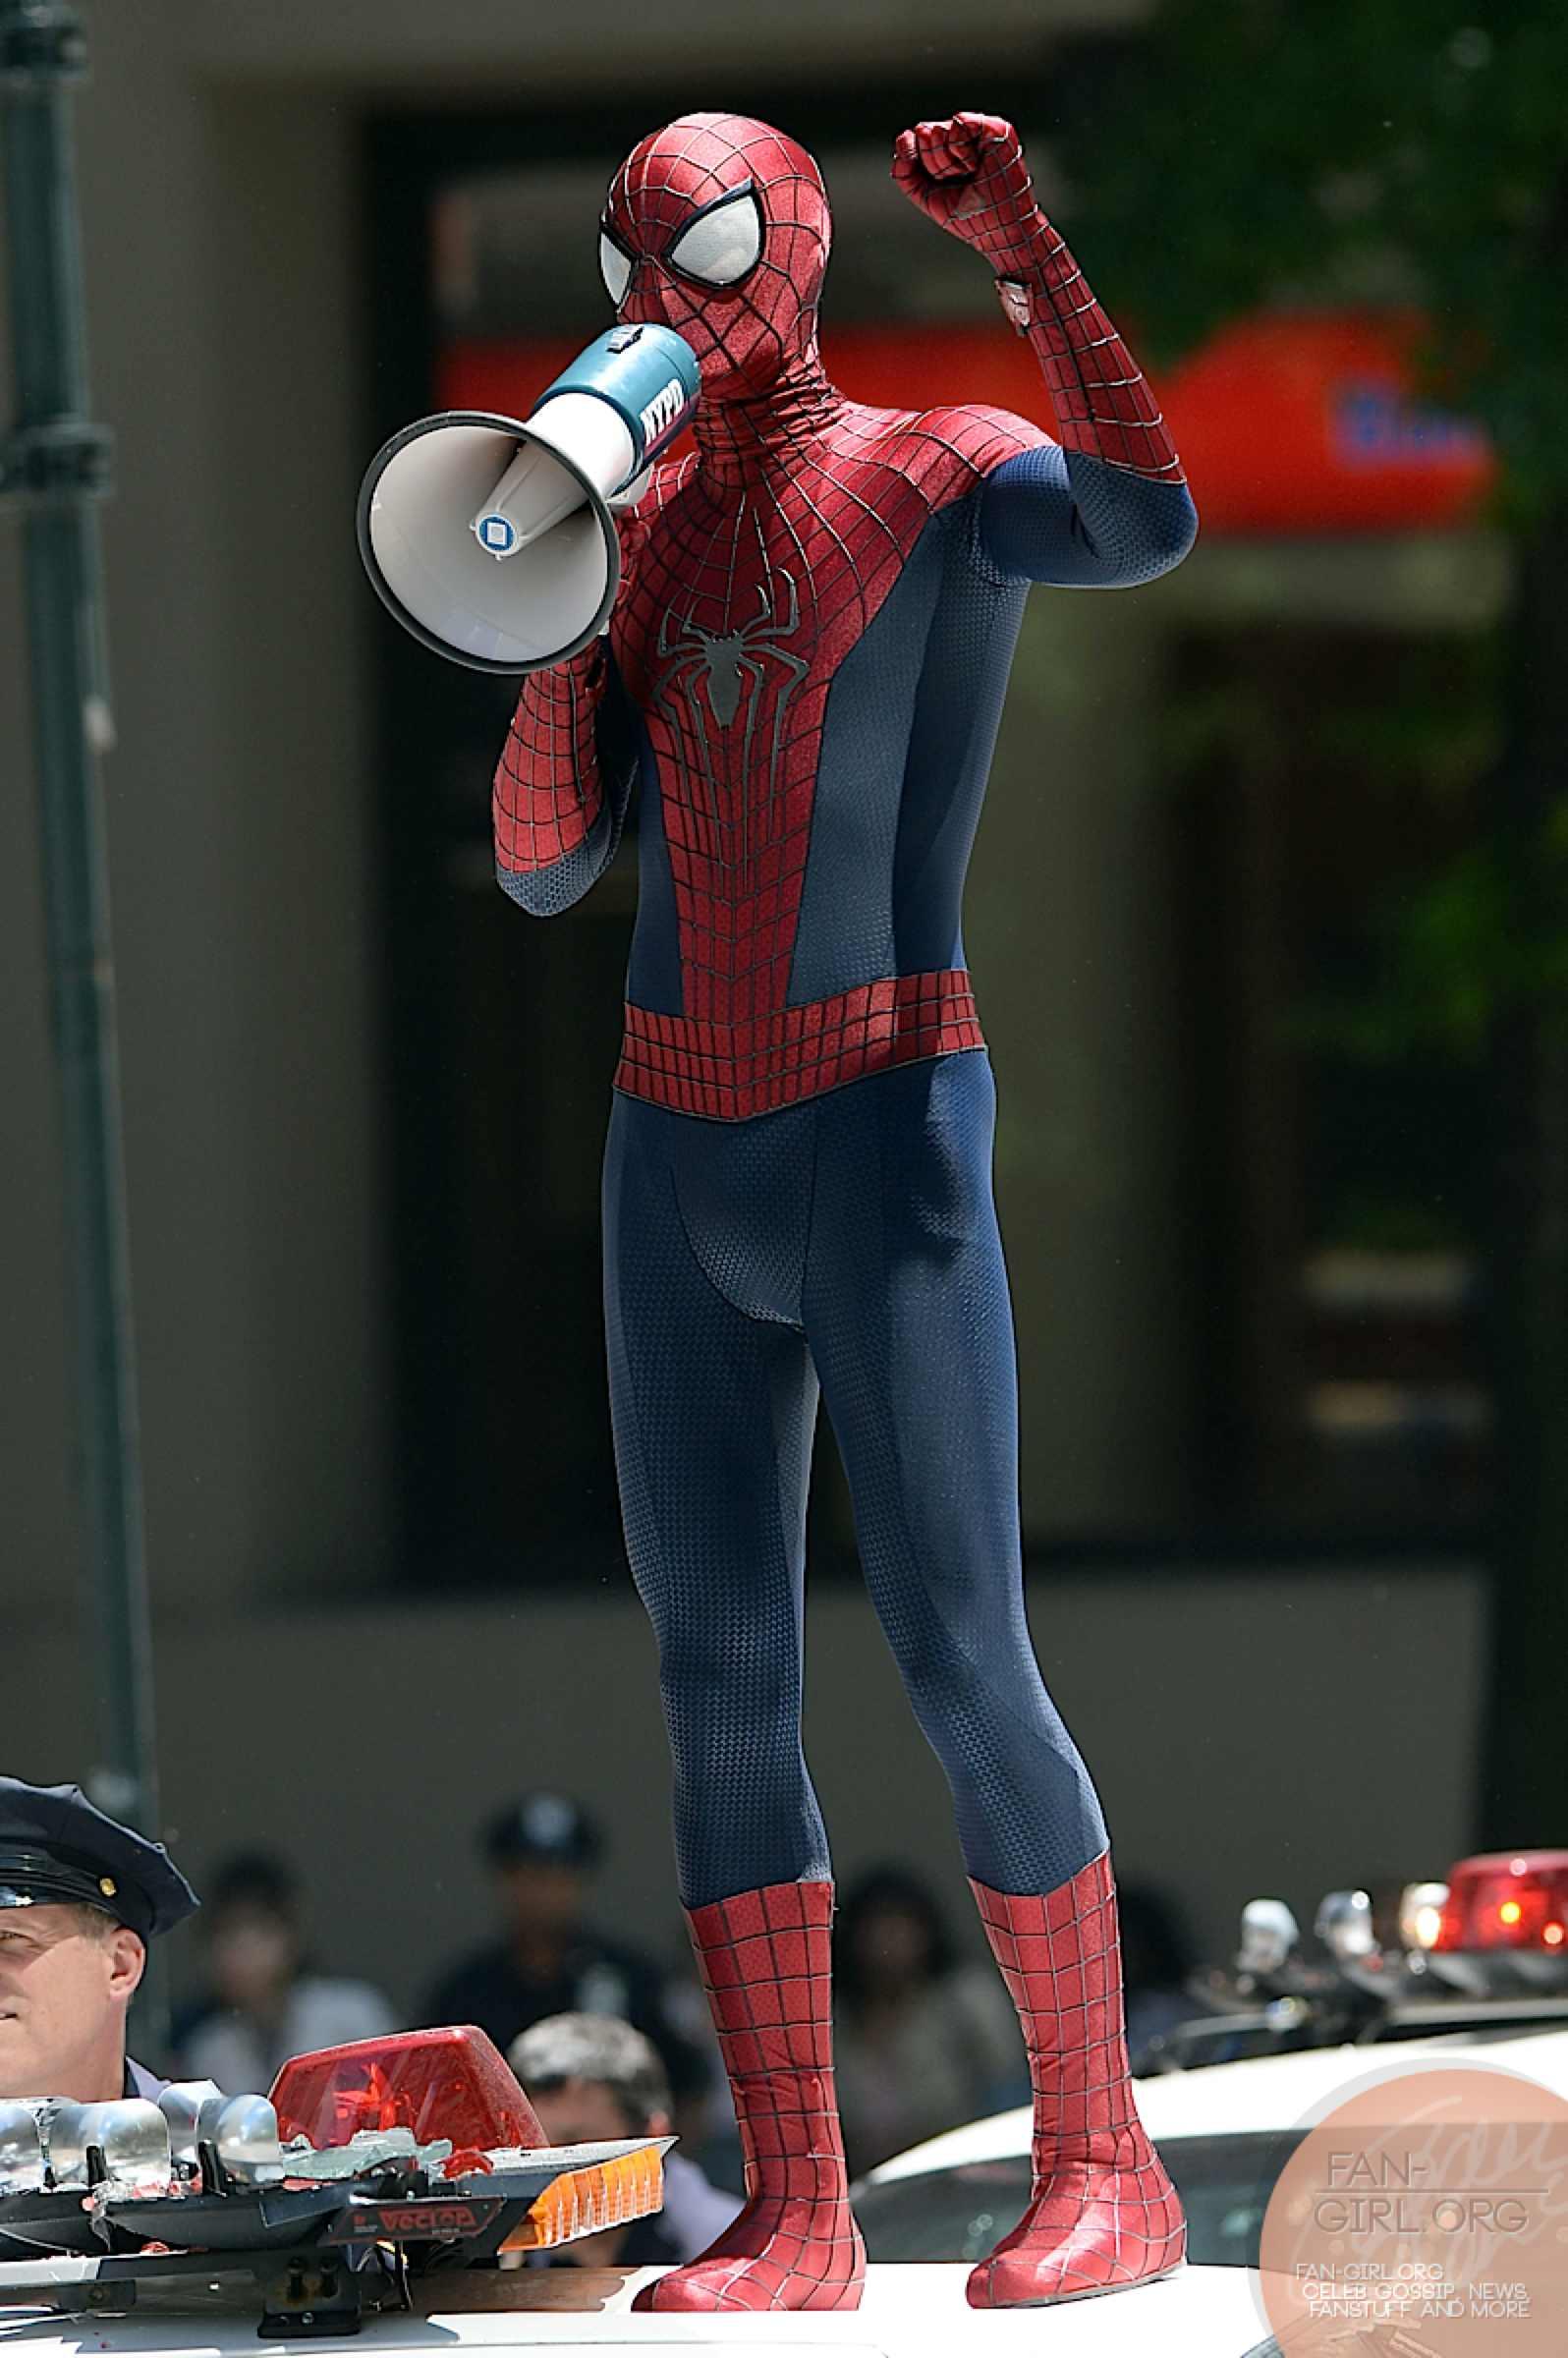 spiderman2_4